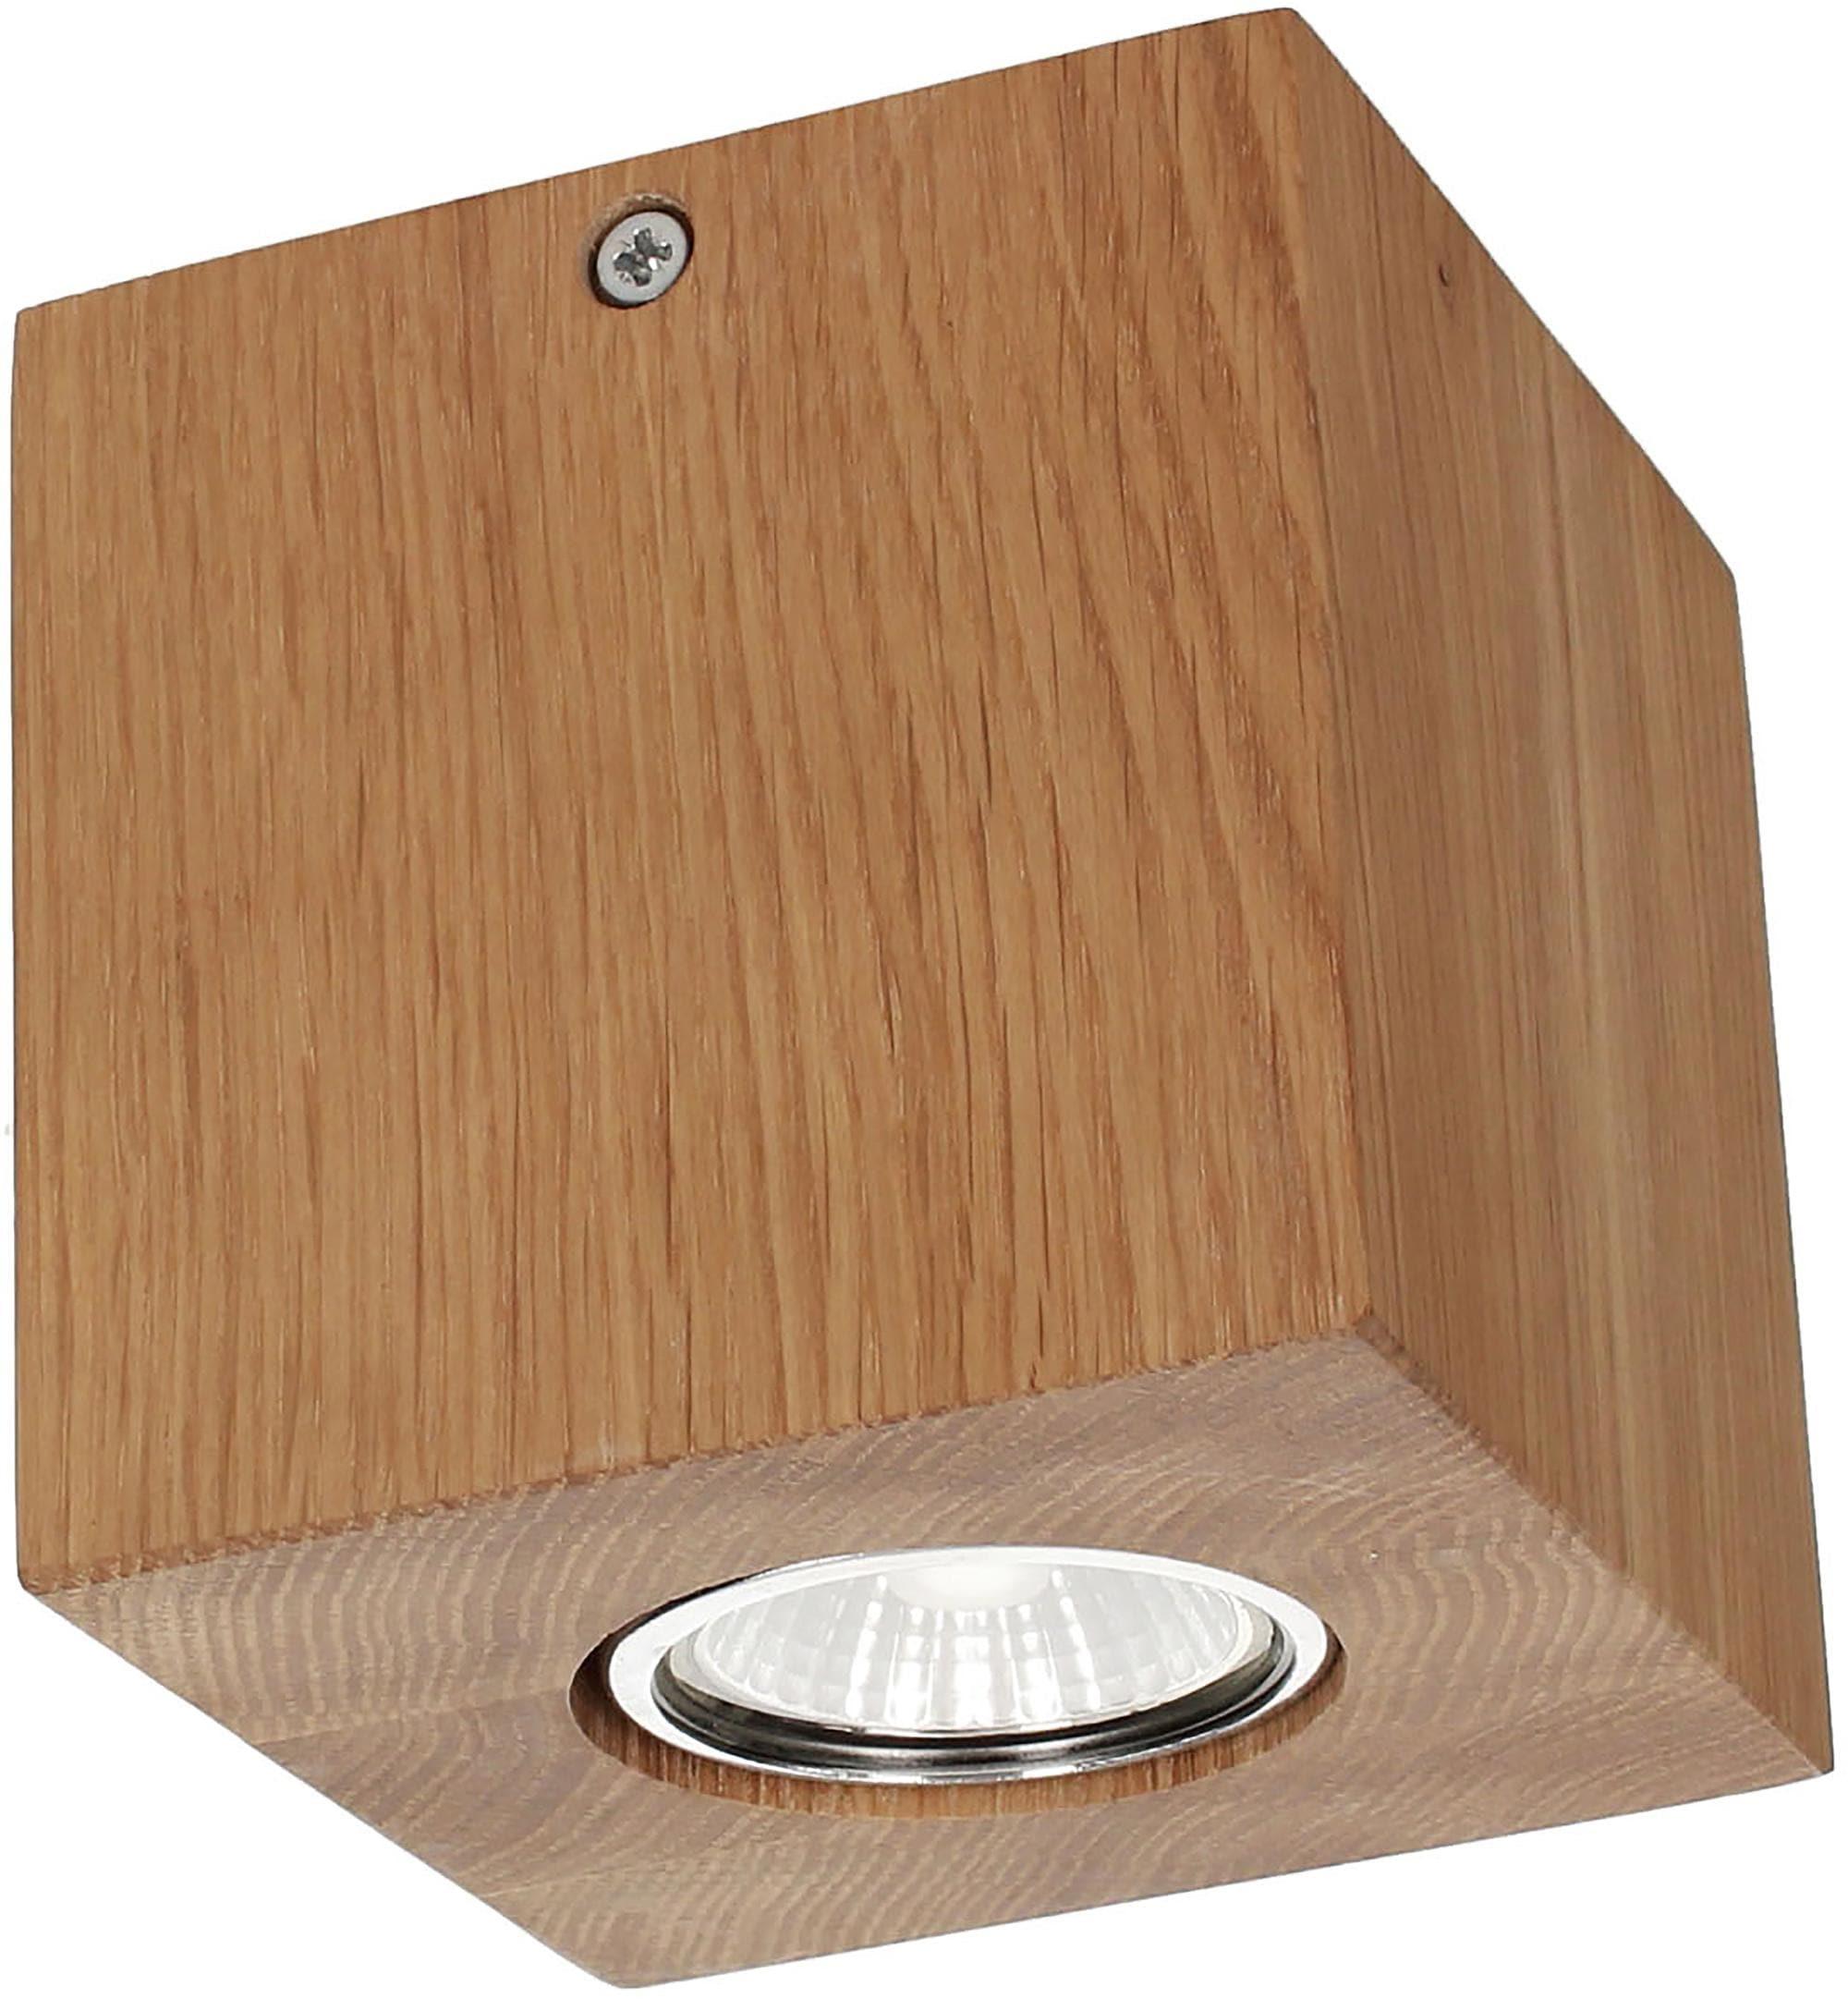 SPOT Light,LED Deckenleuchte»WOODDREAM«, | Lampen > Deckenleuchten > Deckenlampen | Holz - Metall - Eiche - Geölt | SPOT LIGHT